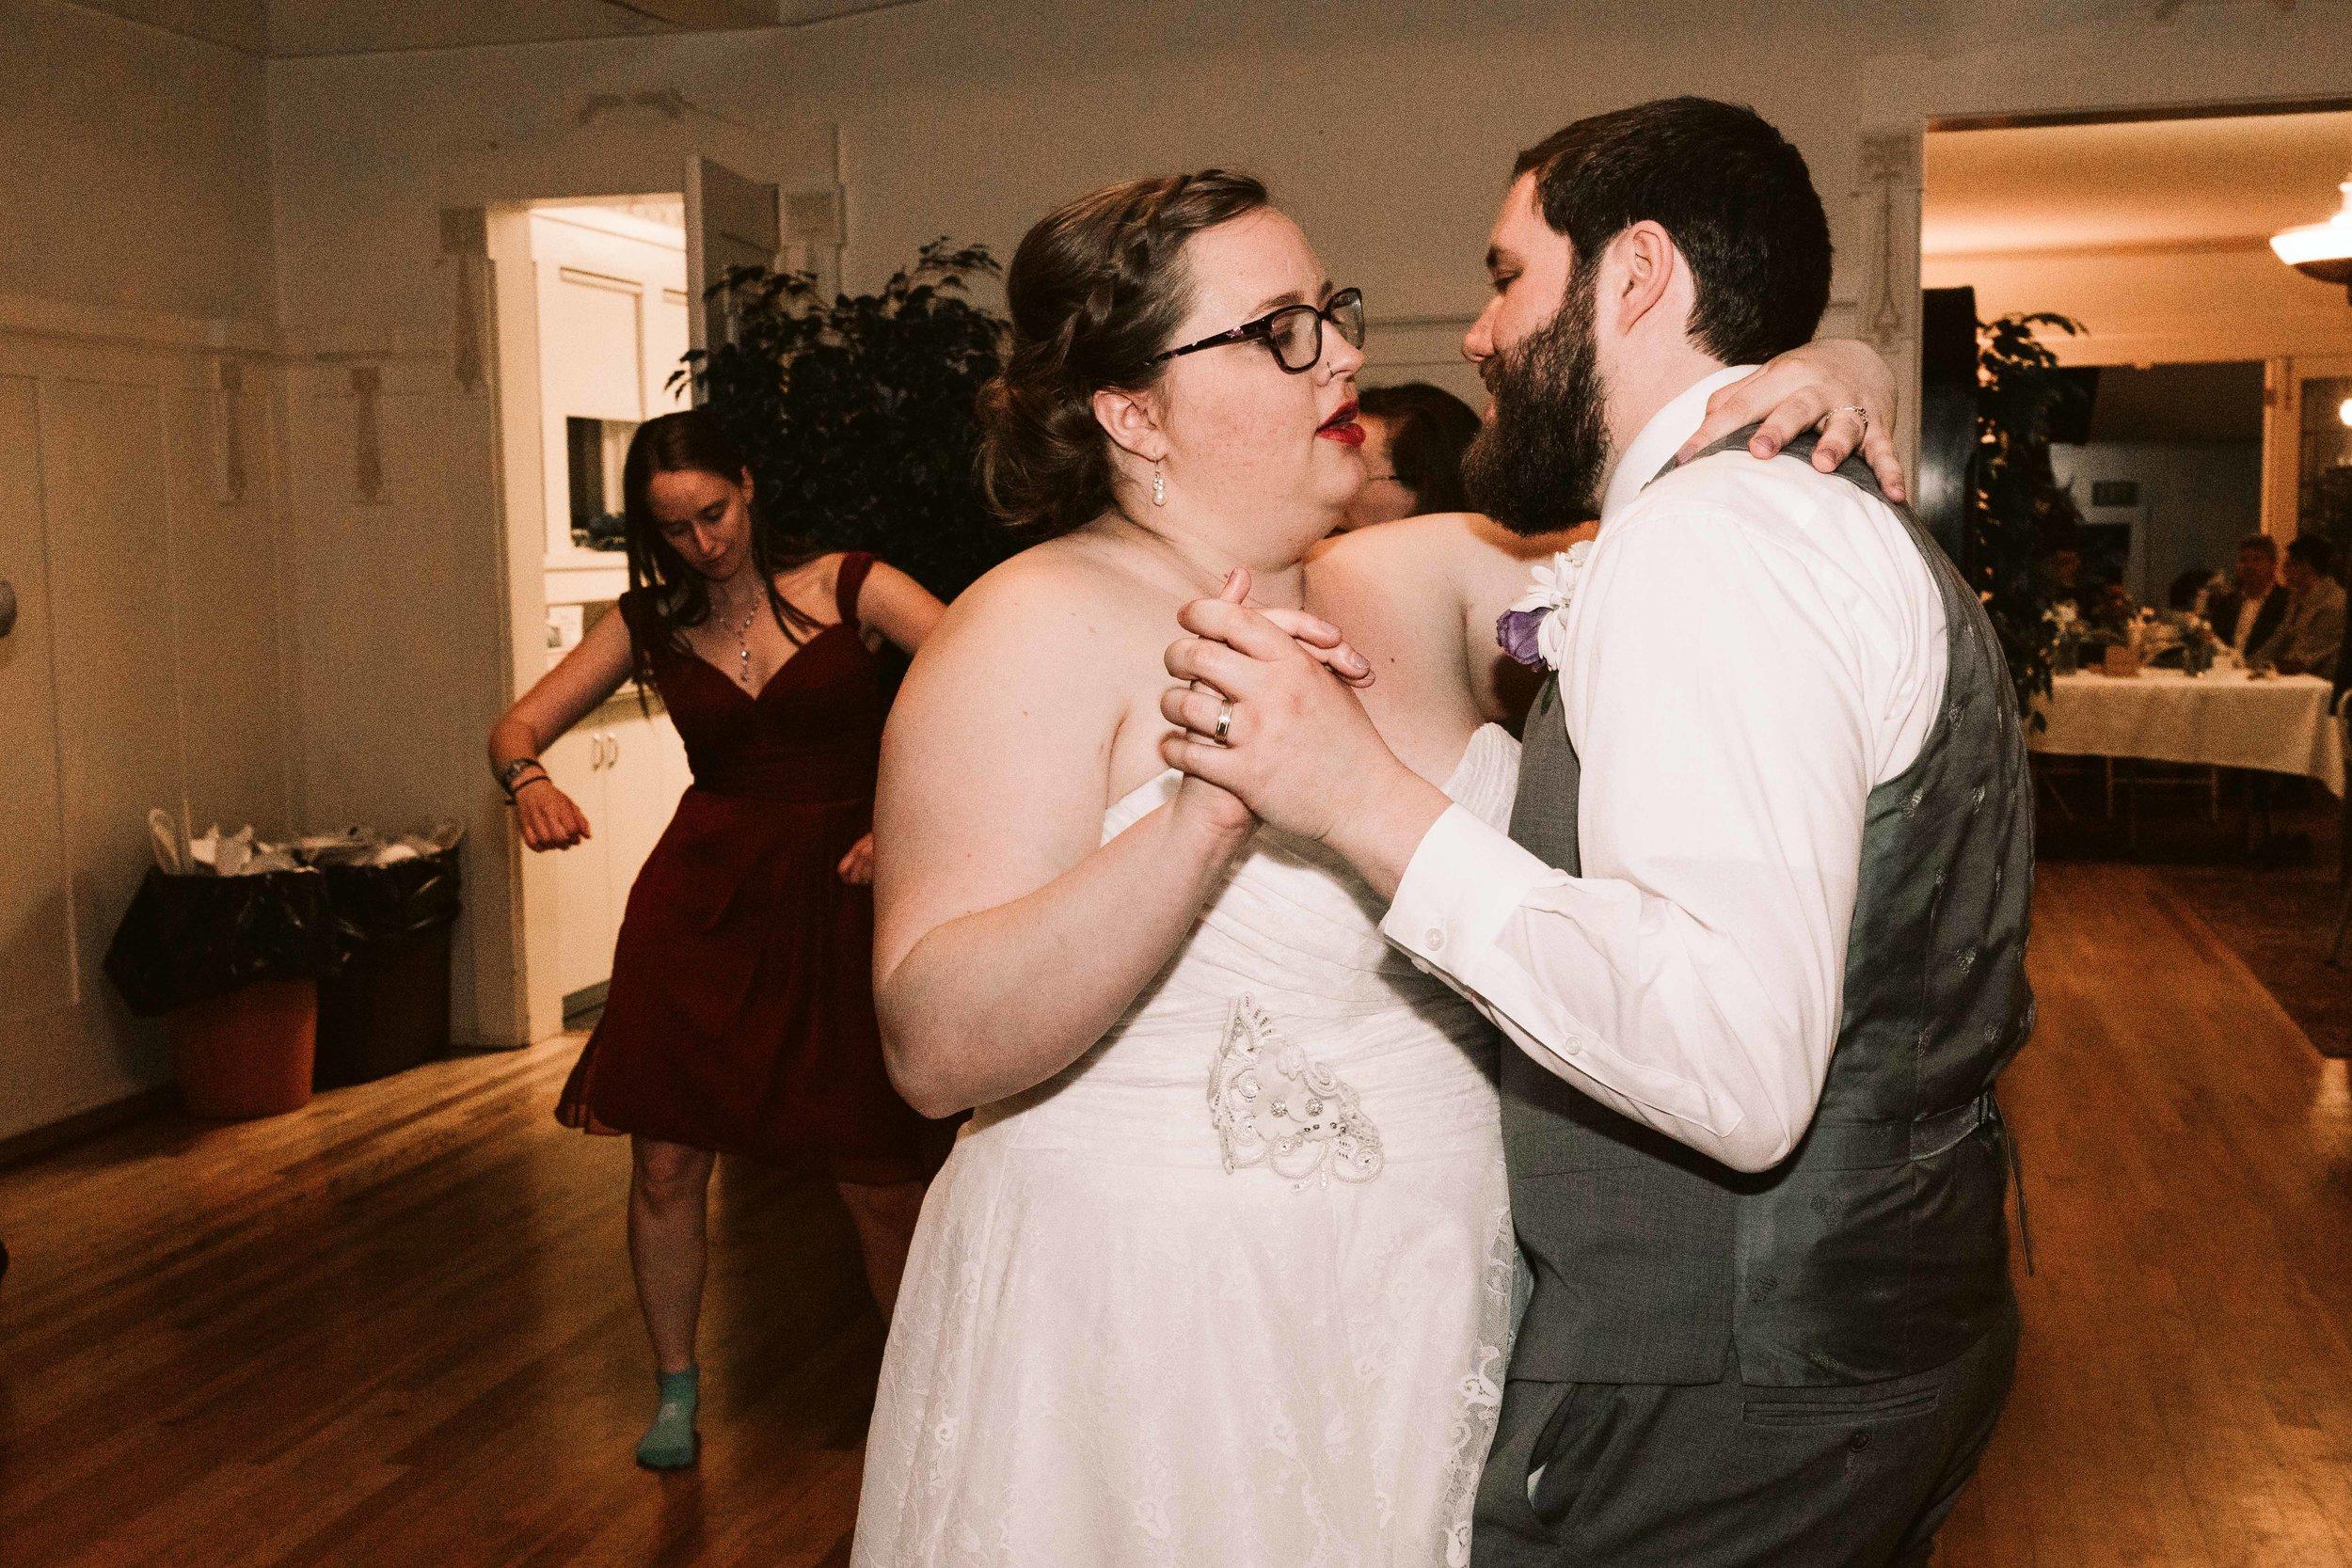 womens-century-club-wedding-99.jpg